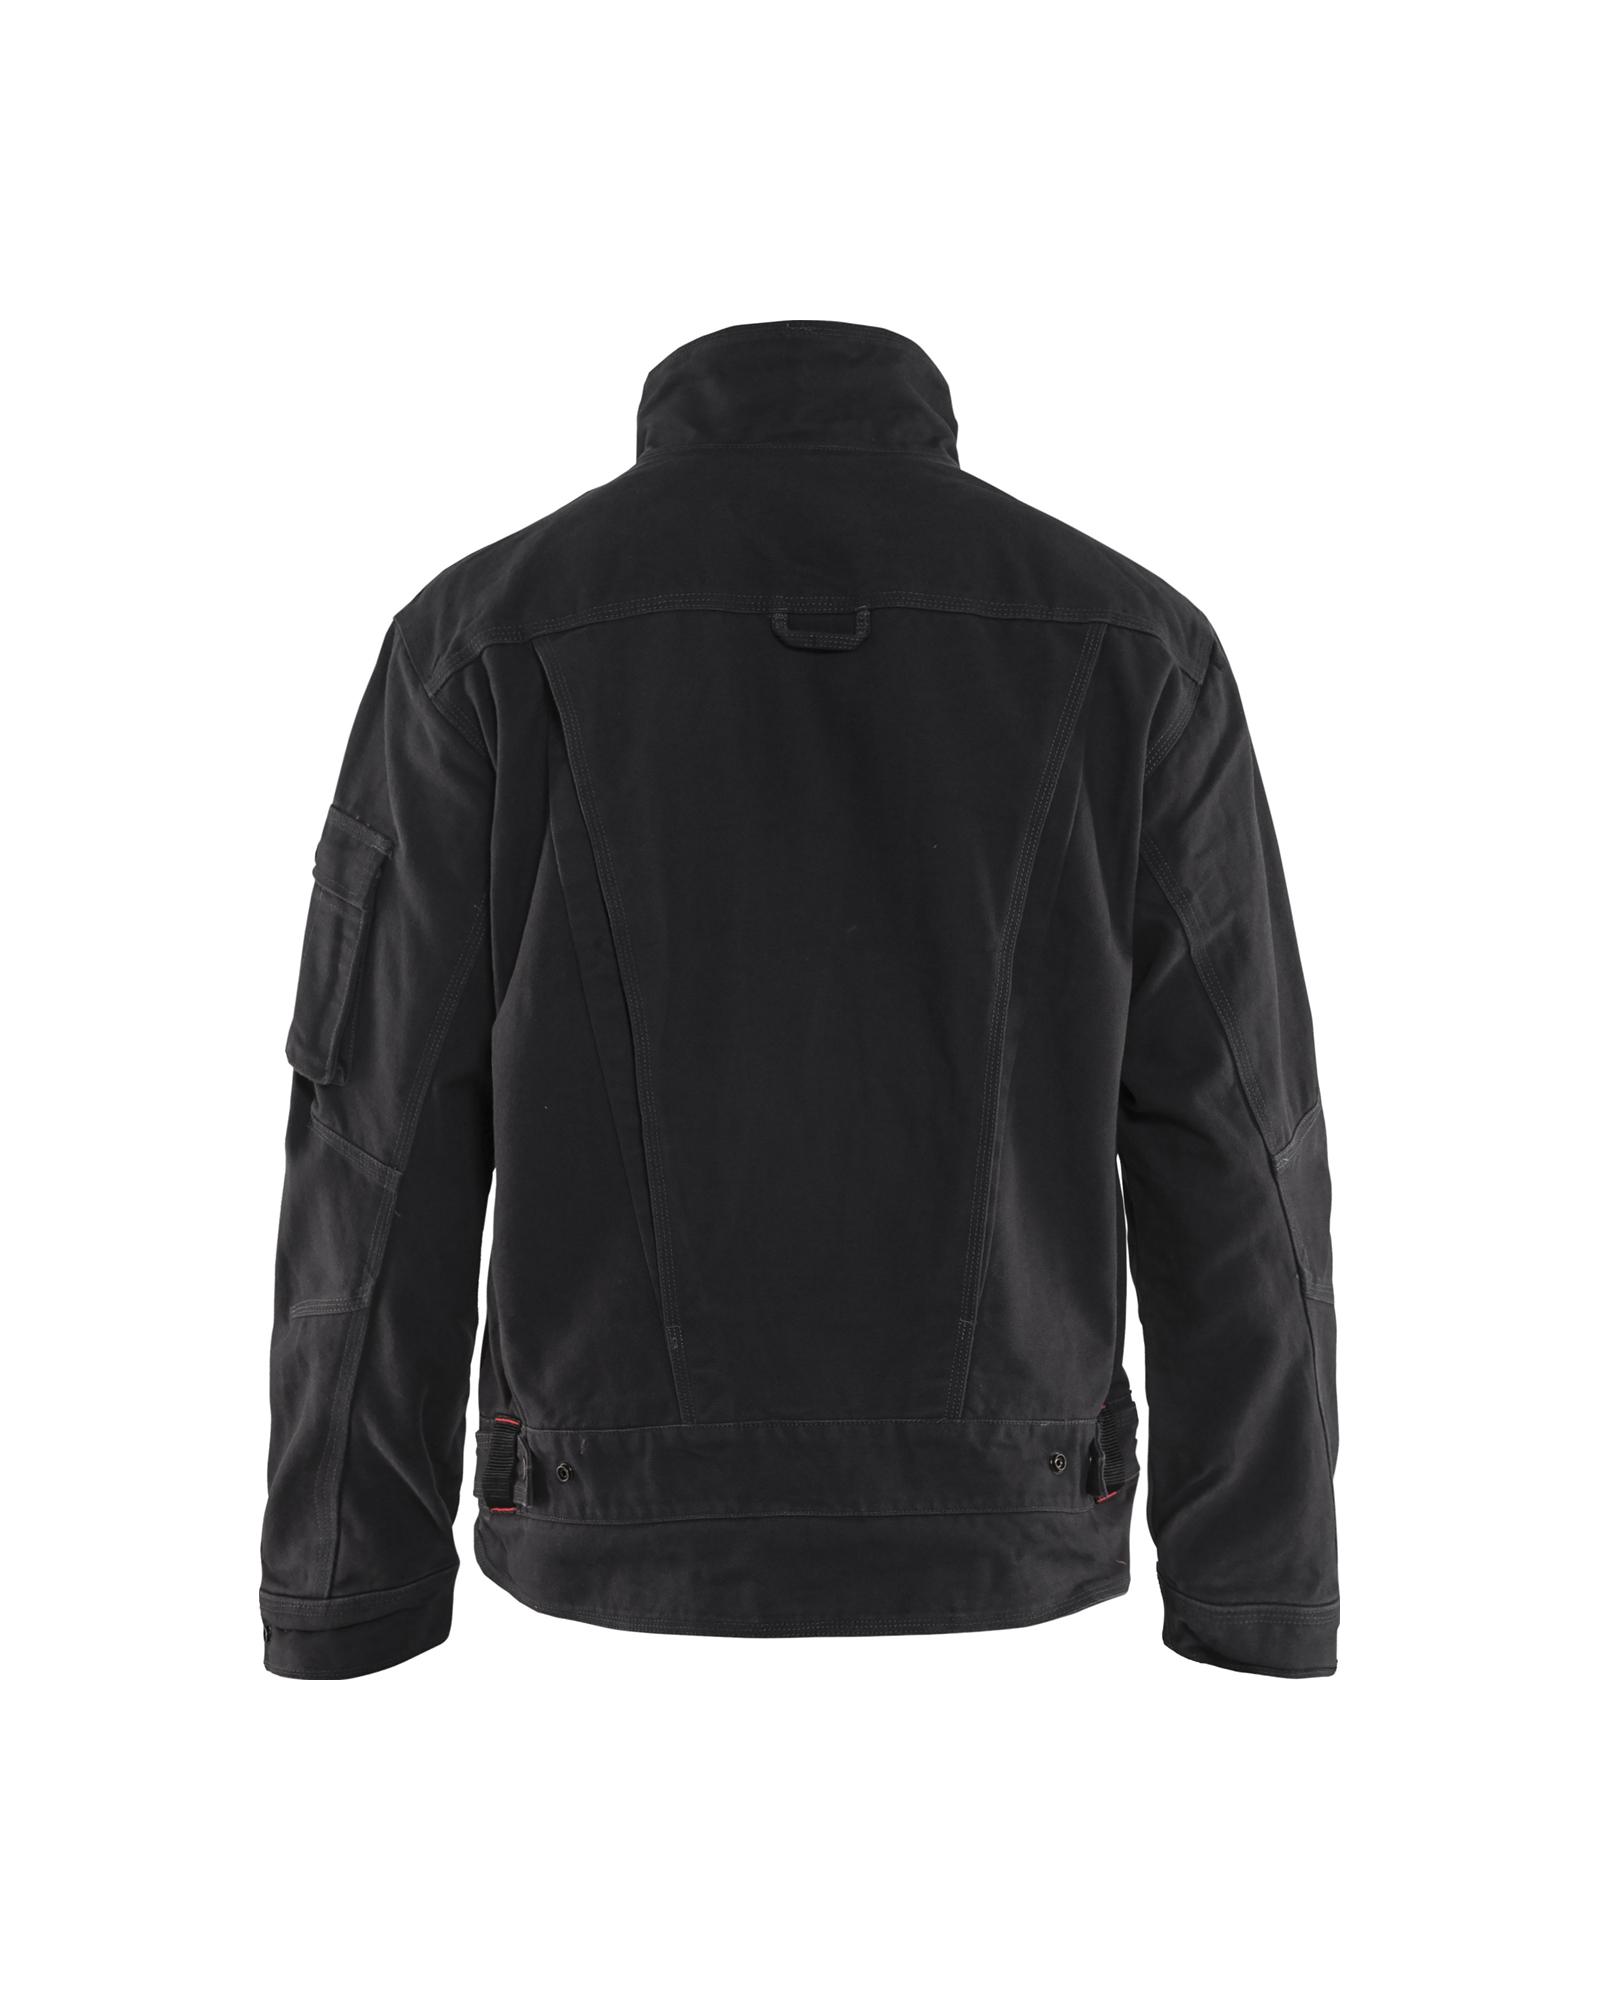 Blaklader 406318608999XXL Craft Profil Jacket Navy Blue//Black XX-Large